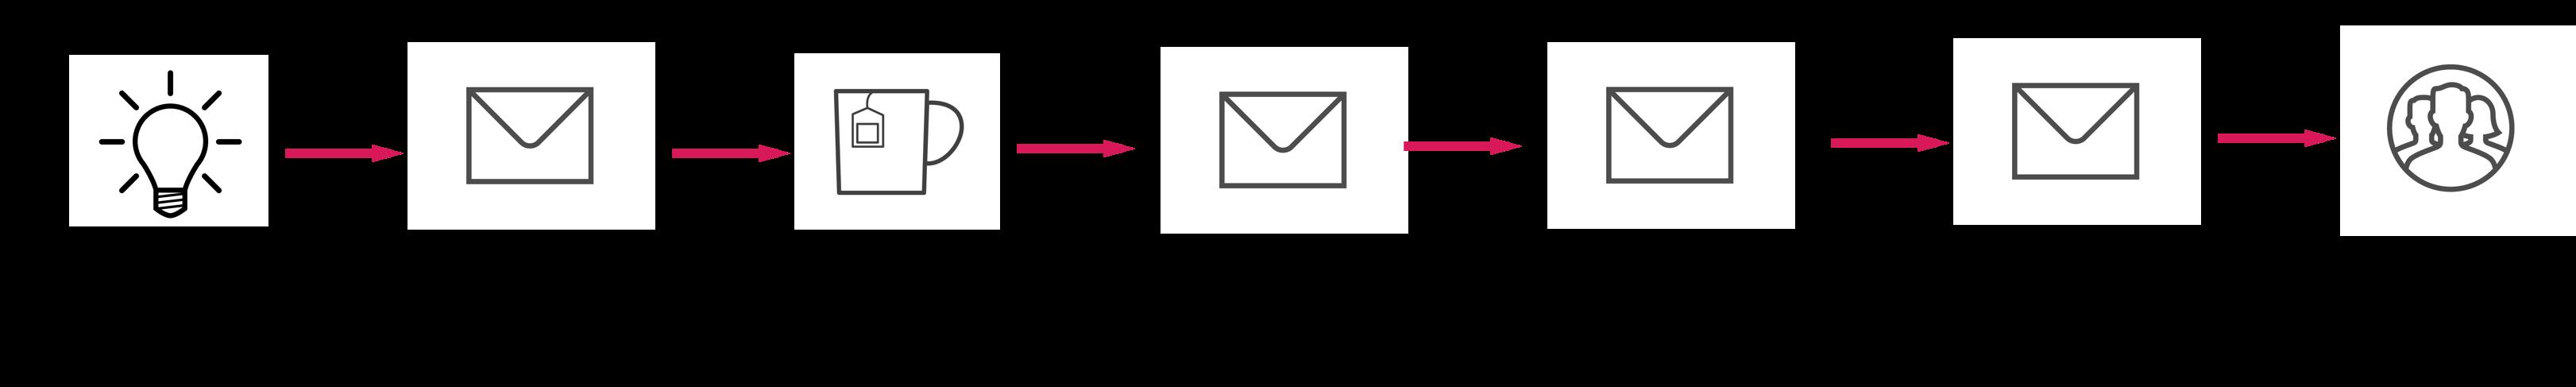 Workflow_illustrasjon2.png